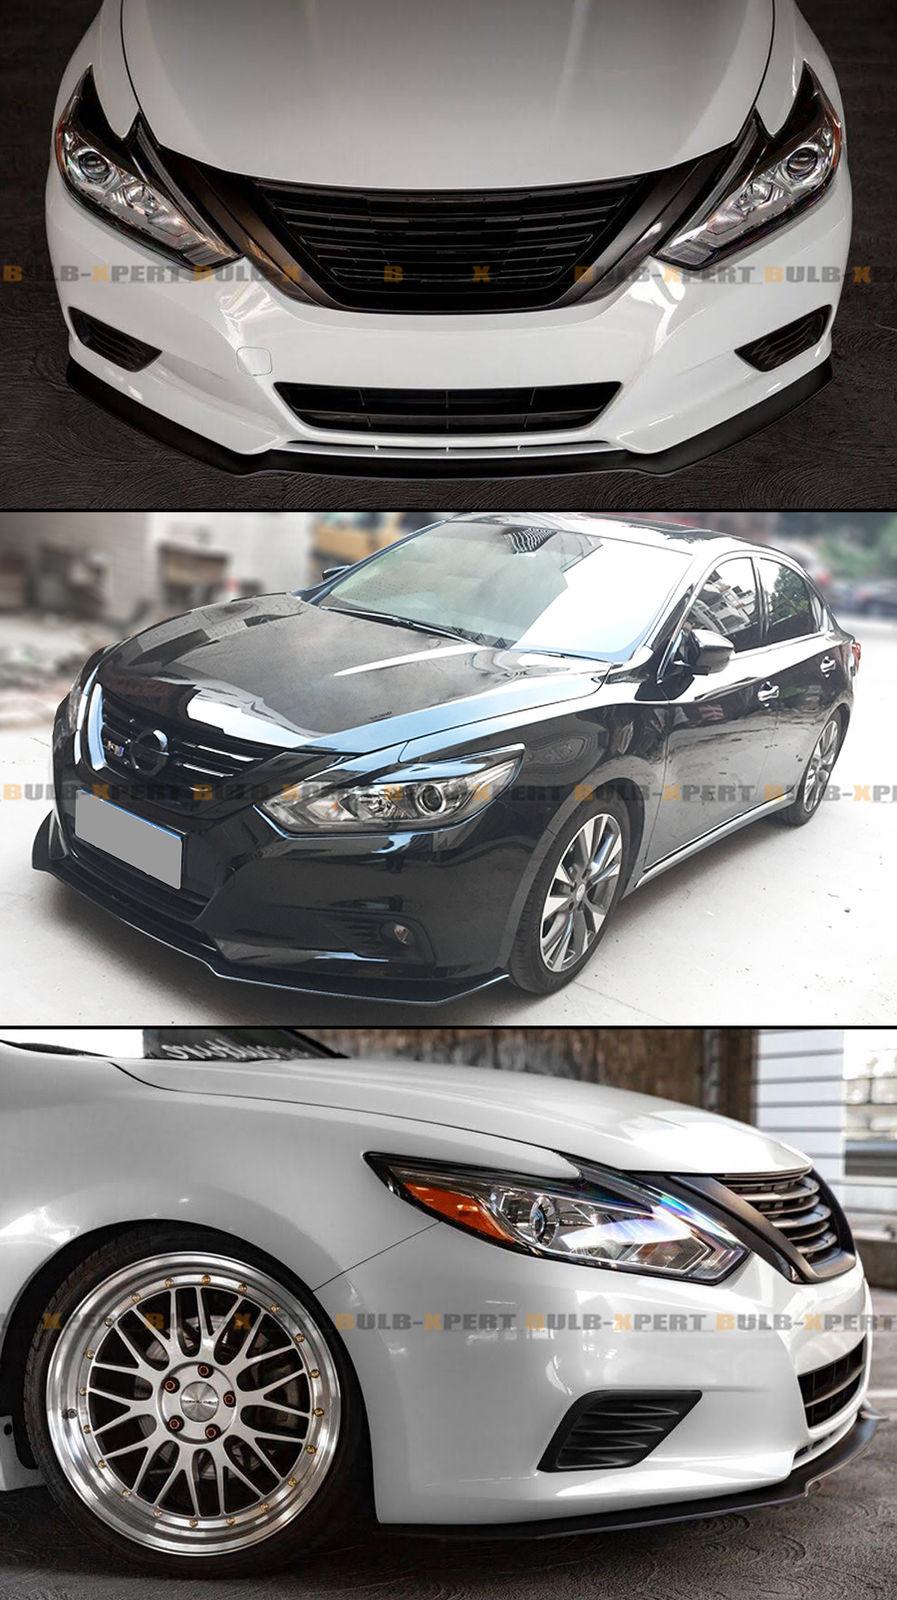 For 2016 2018 Nissan Altima 4 Door Sedan Black Jdm Front Lip Bumper Splitter 2018 2019 Is In Stock And For Sale Mycarboard Com